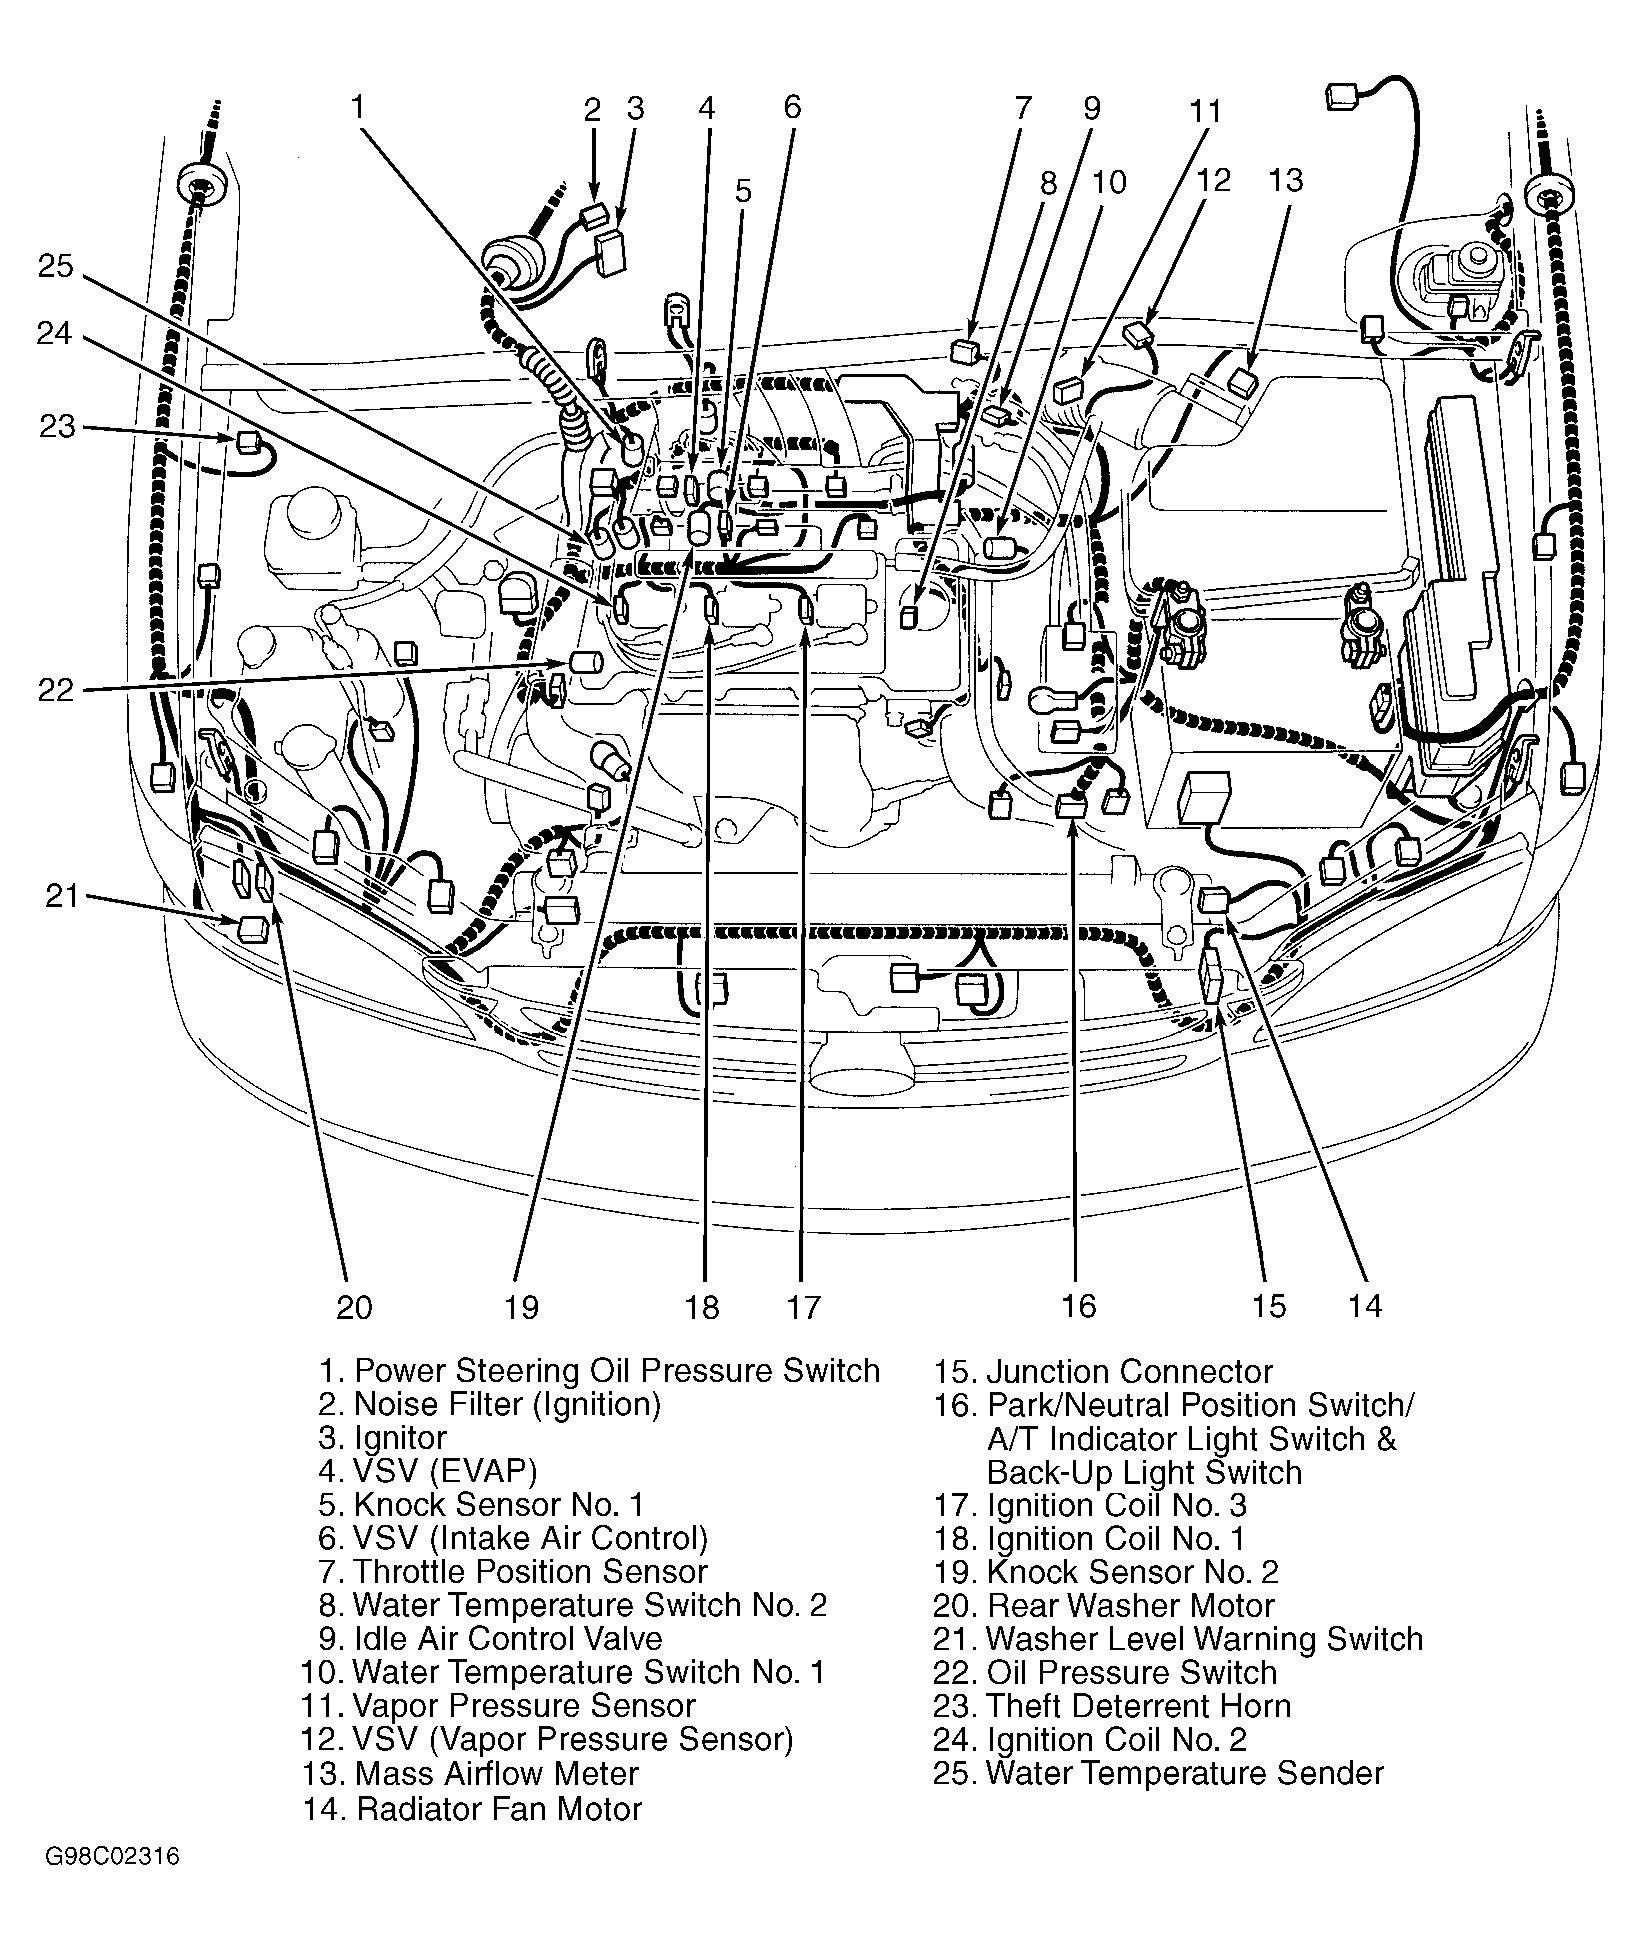 2001 toyota camry engine diagram 2006 toyota camry wiring diagram wiring data of 2001 toyota camry